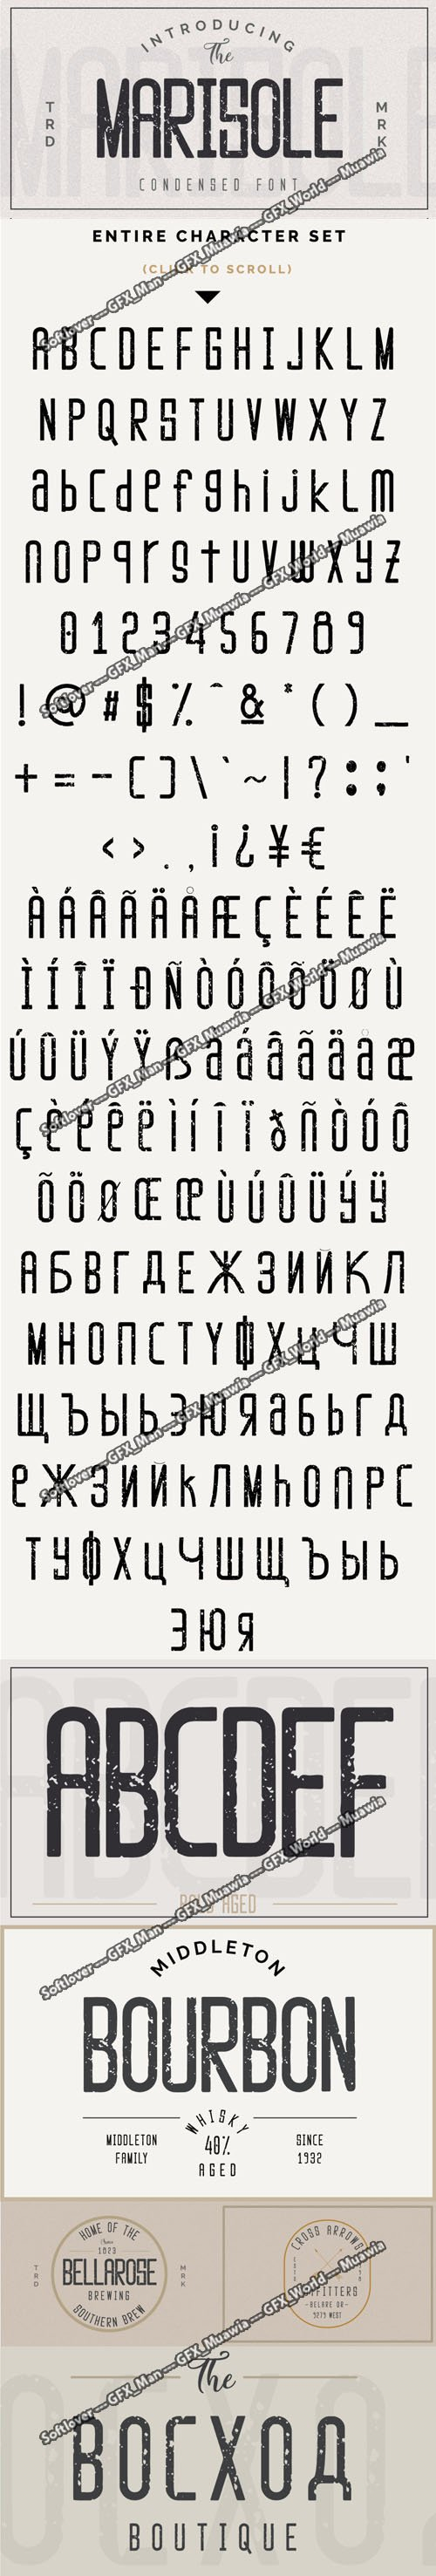 Marisole Textured Font